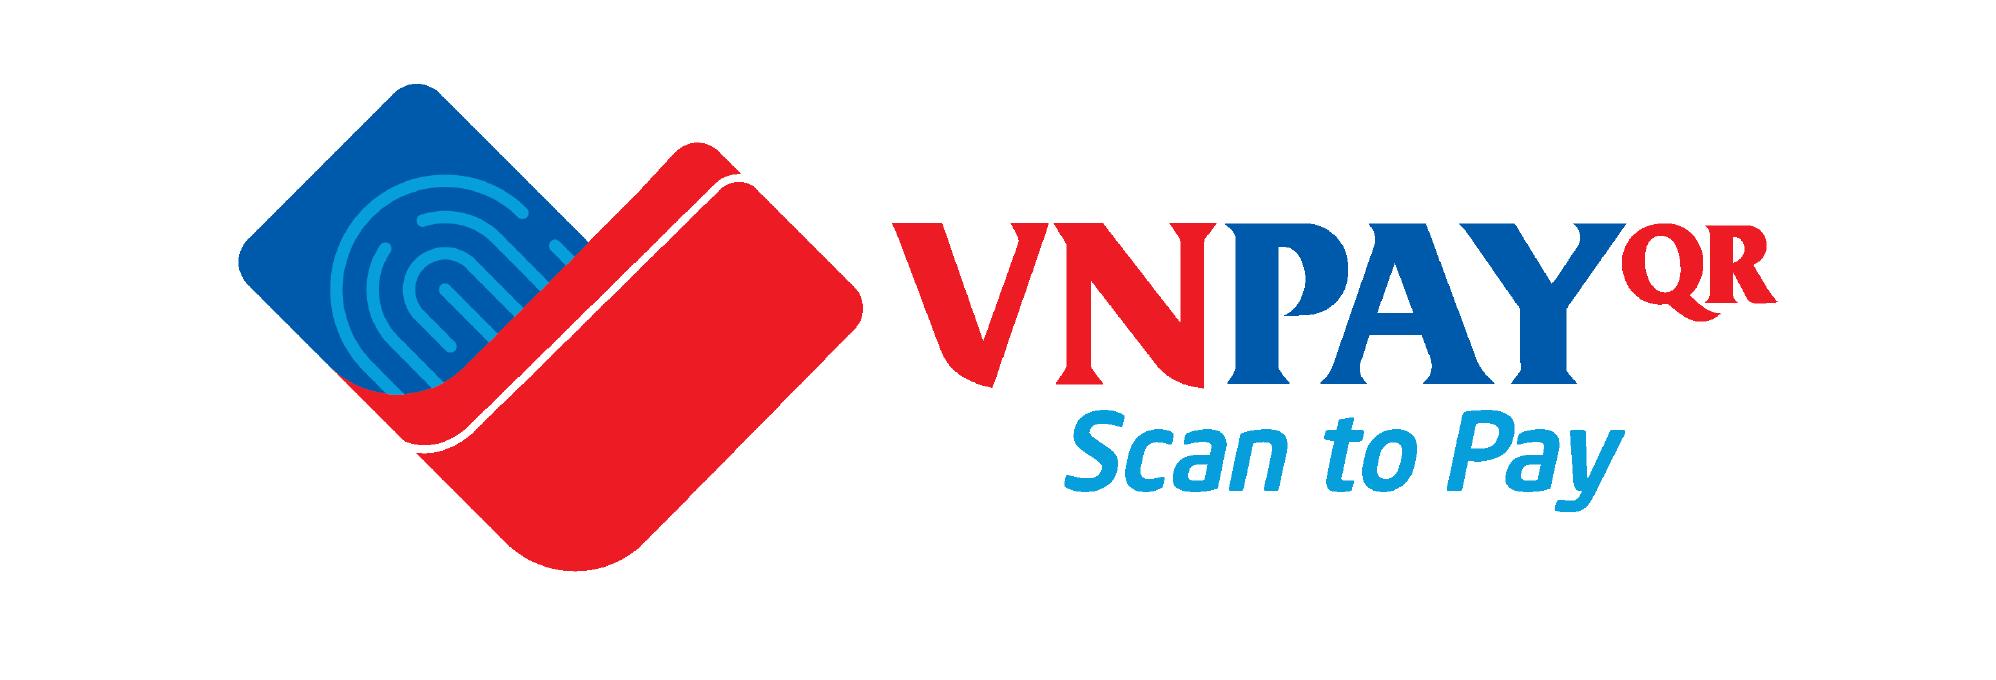 VNPAY